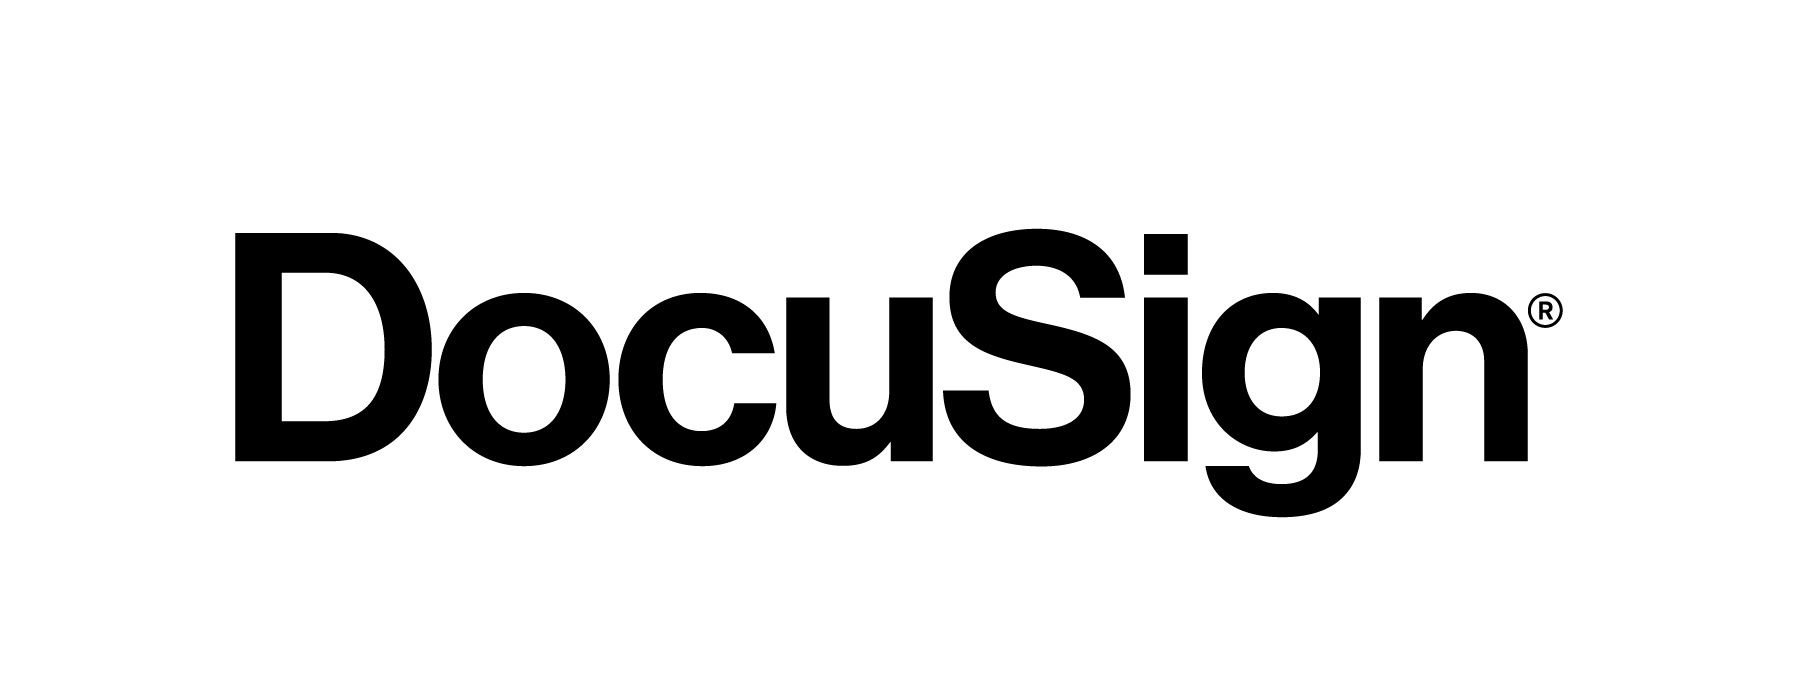 DocuSign's logo